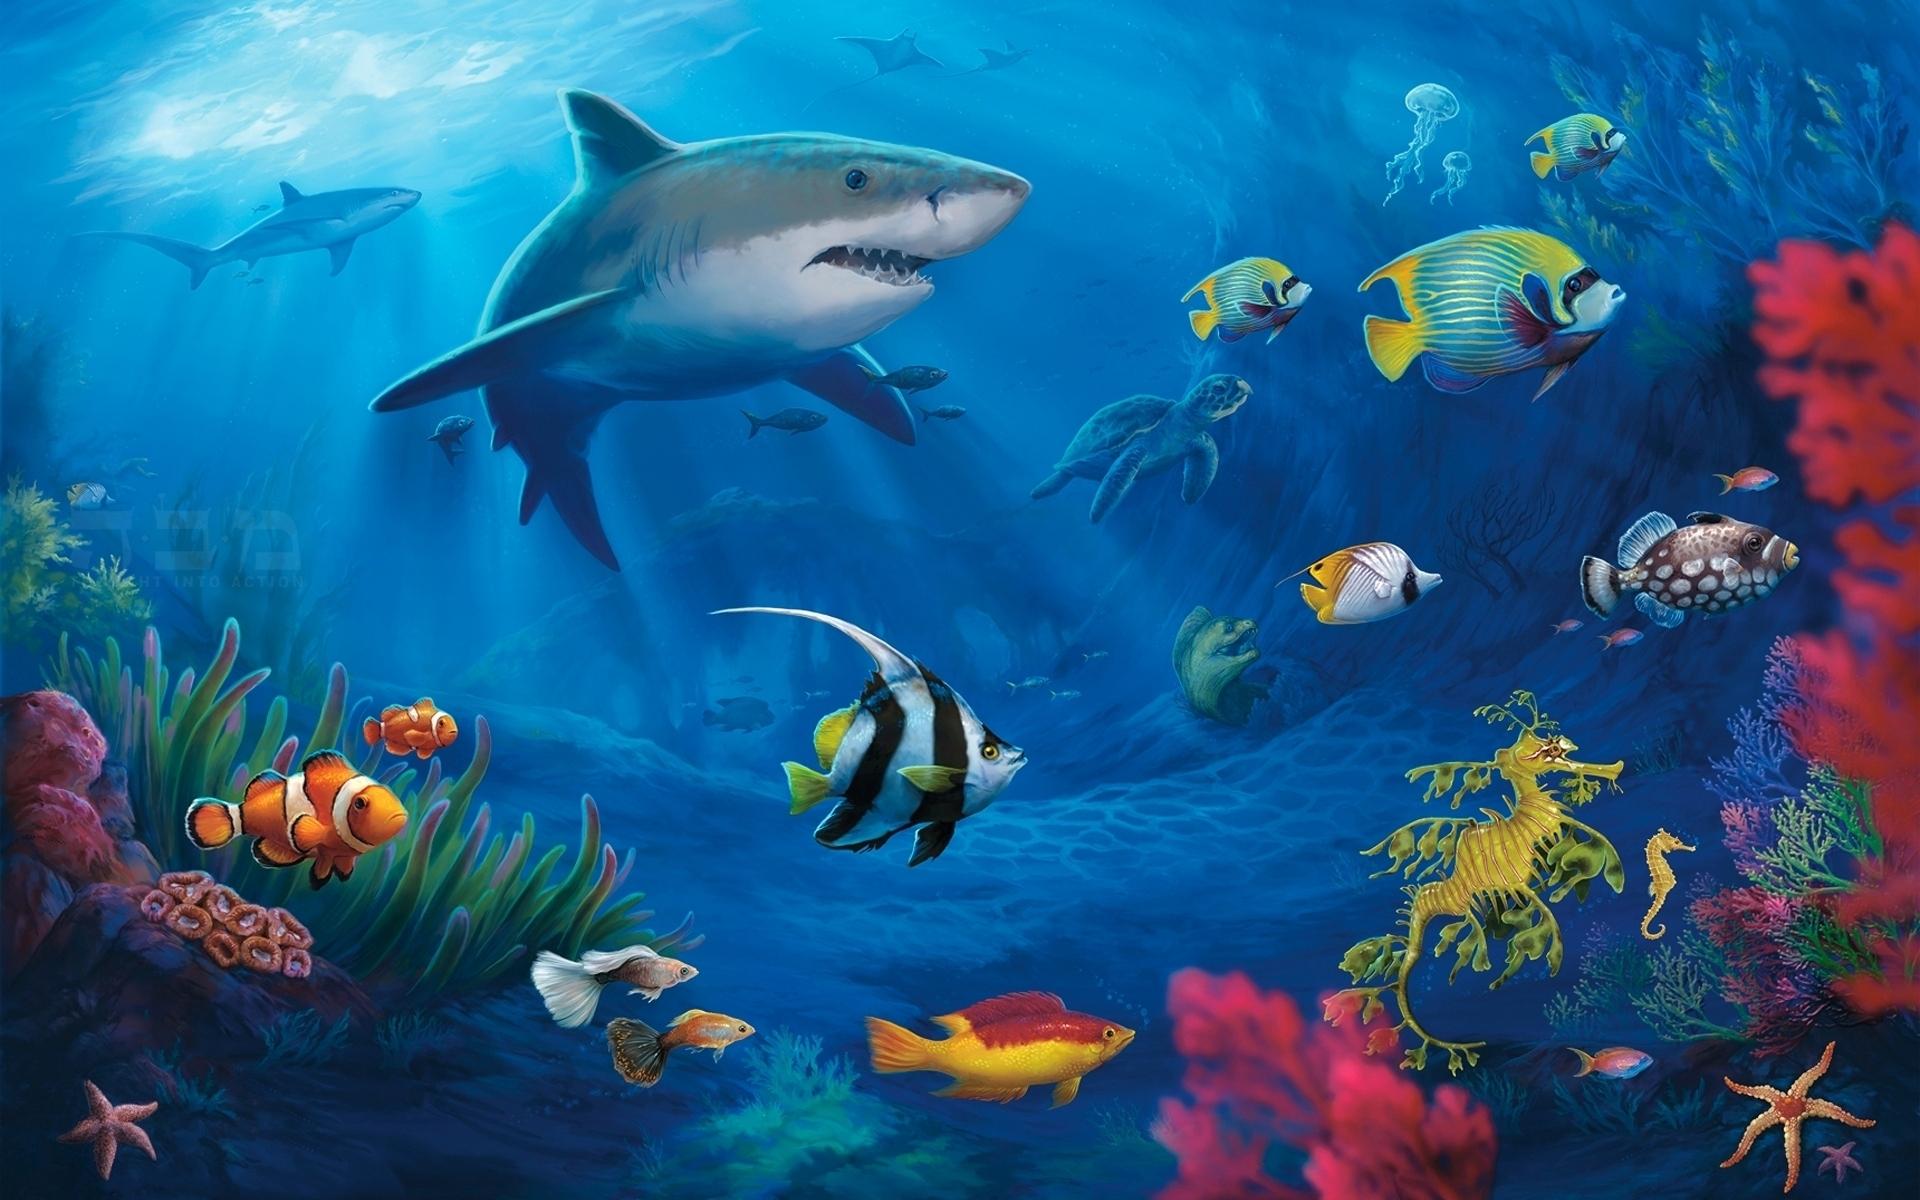 Titanic Ship 3d Wallpaper Free Download Underwater Wallpapers Hd Pixelstalk Net